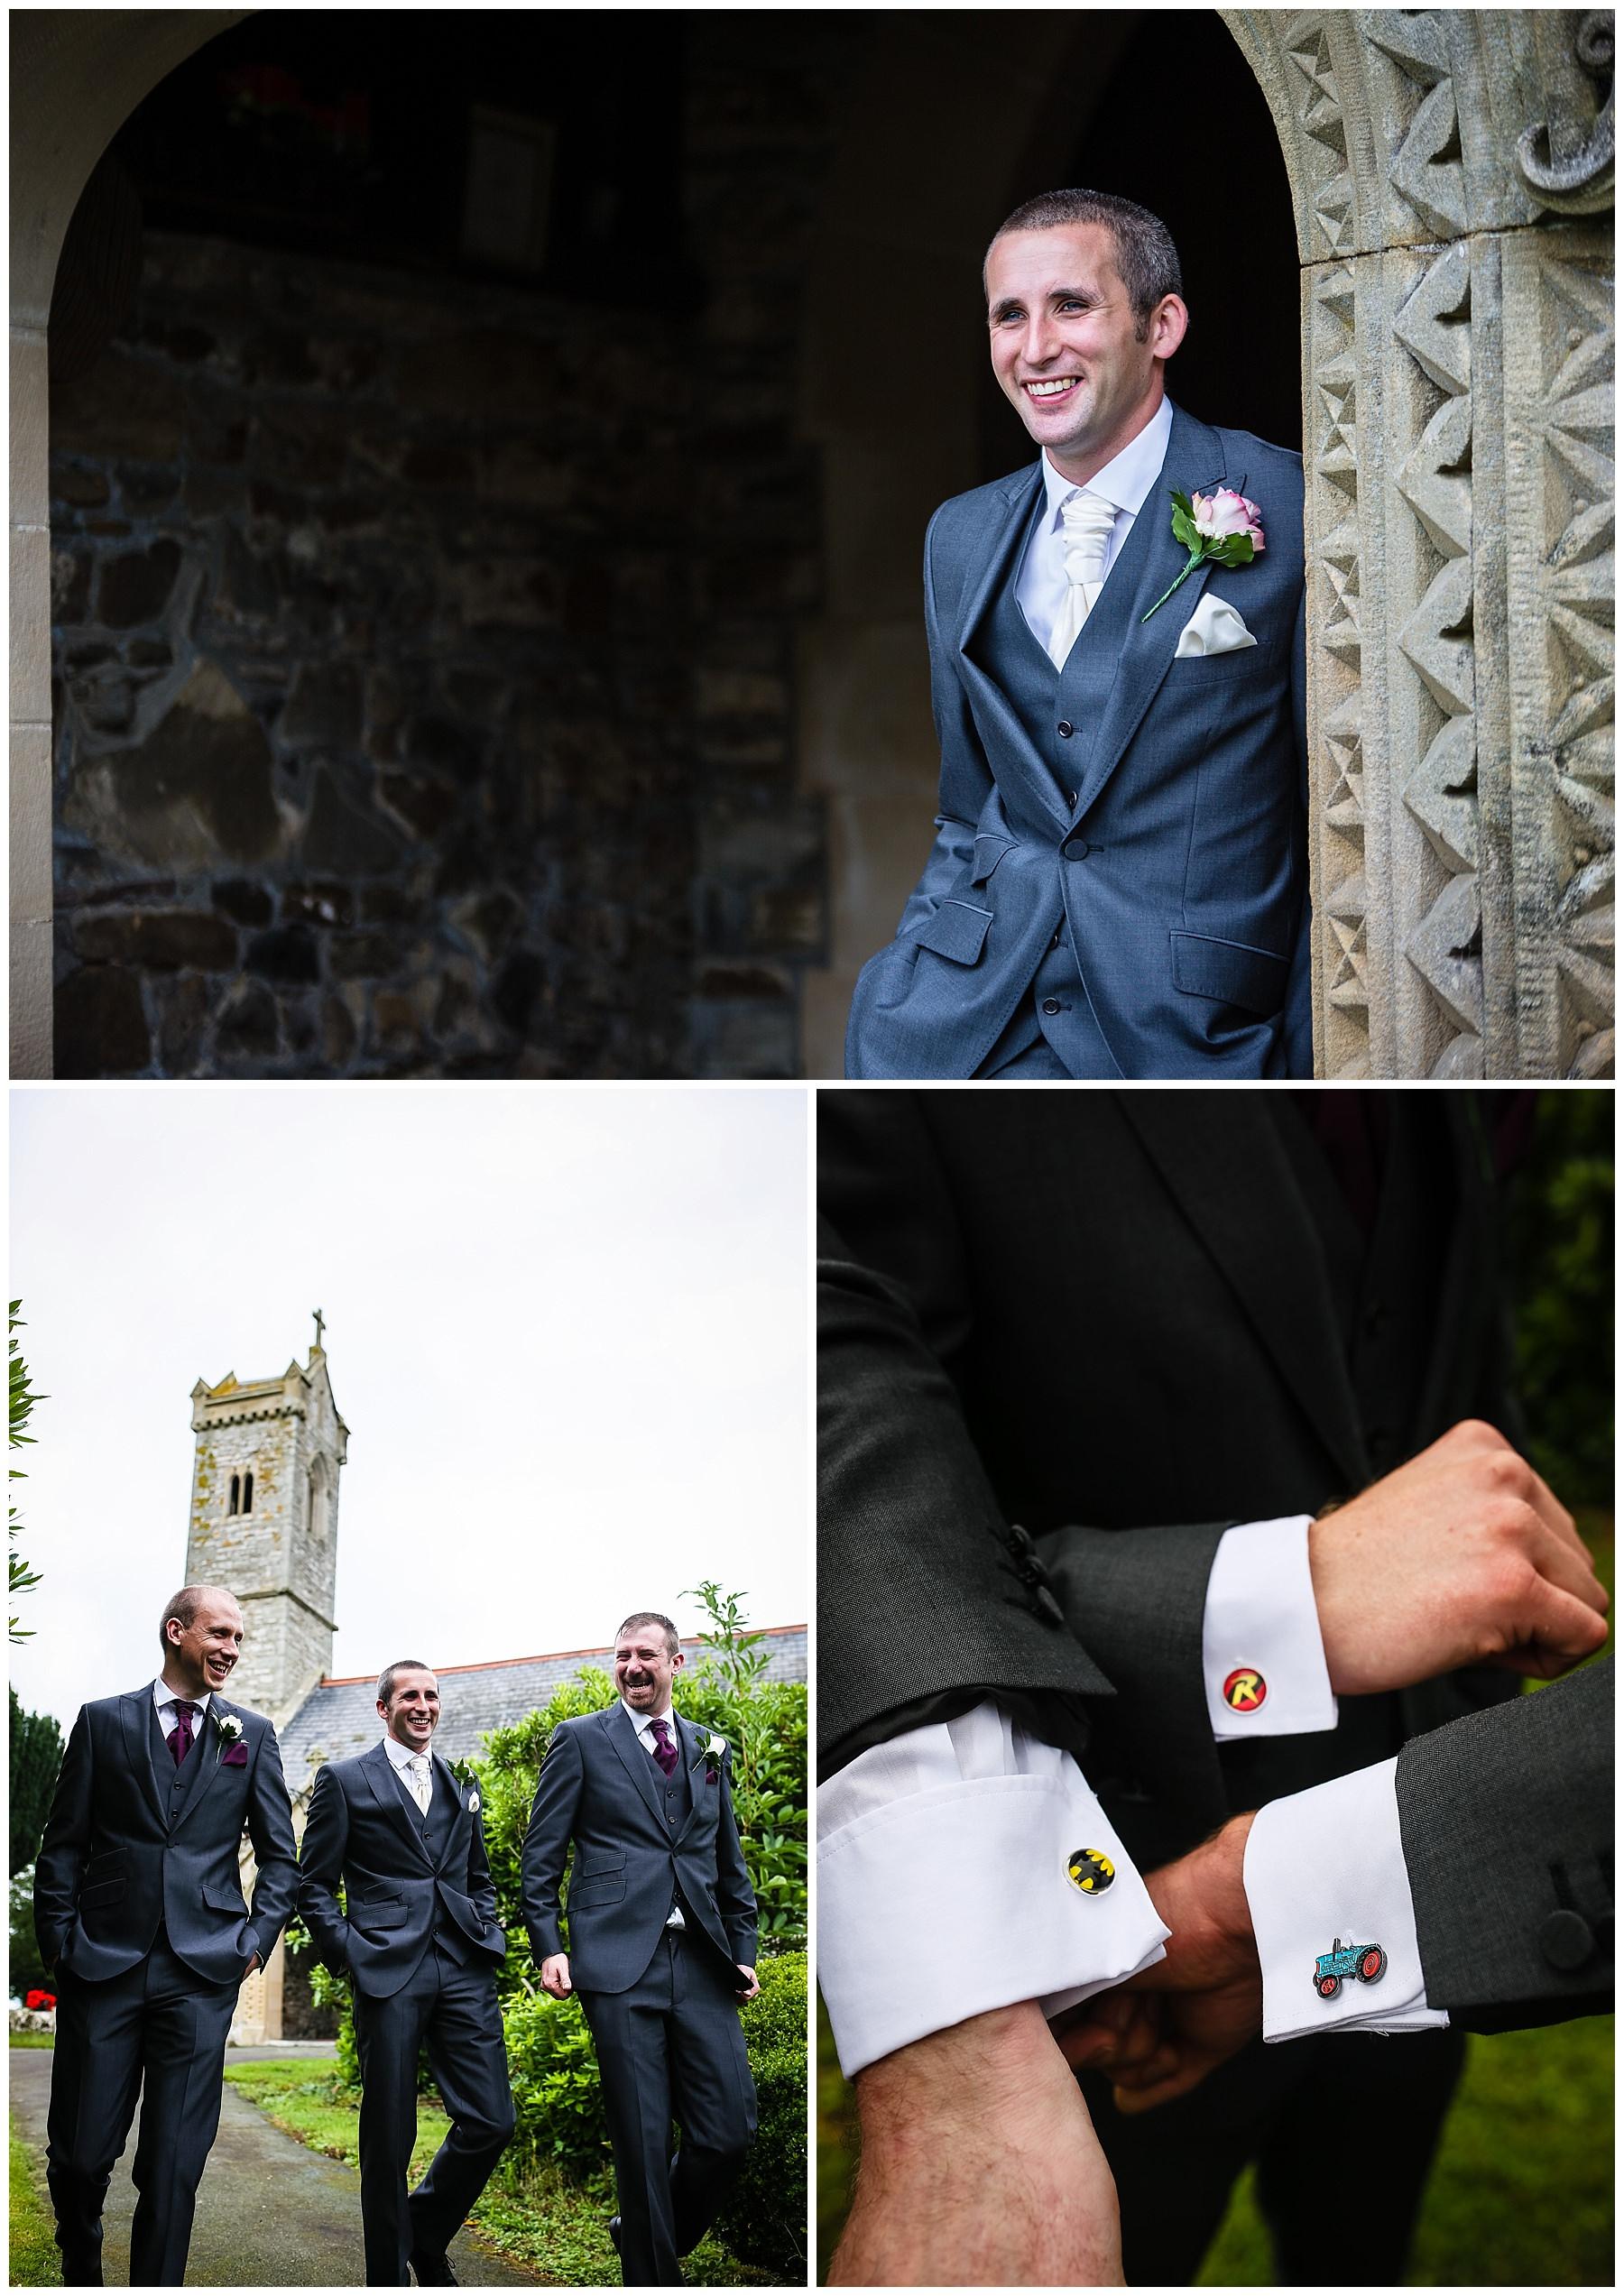 Groom and his groomsmen at St.Llwchaiarn's Church, Llanmerewig